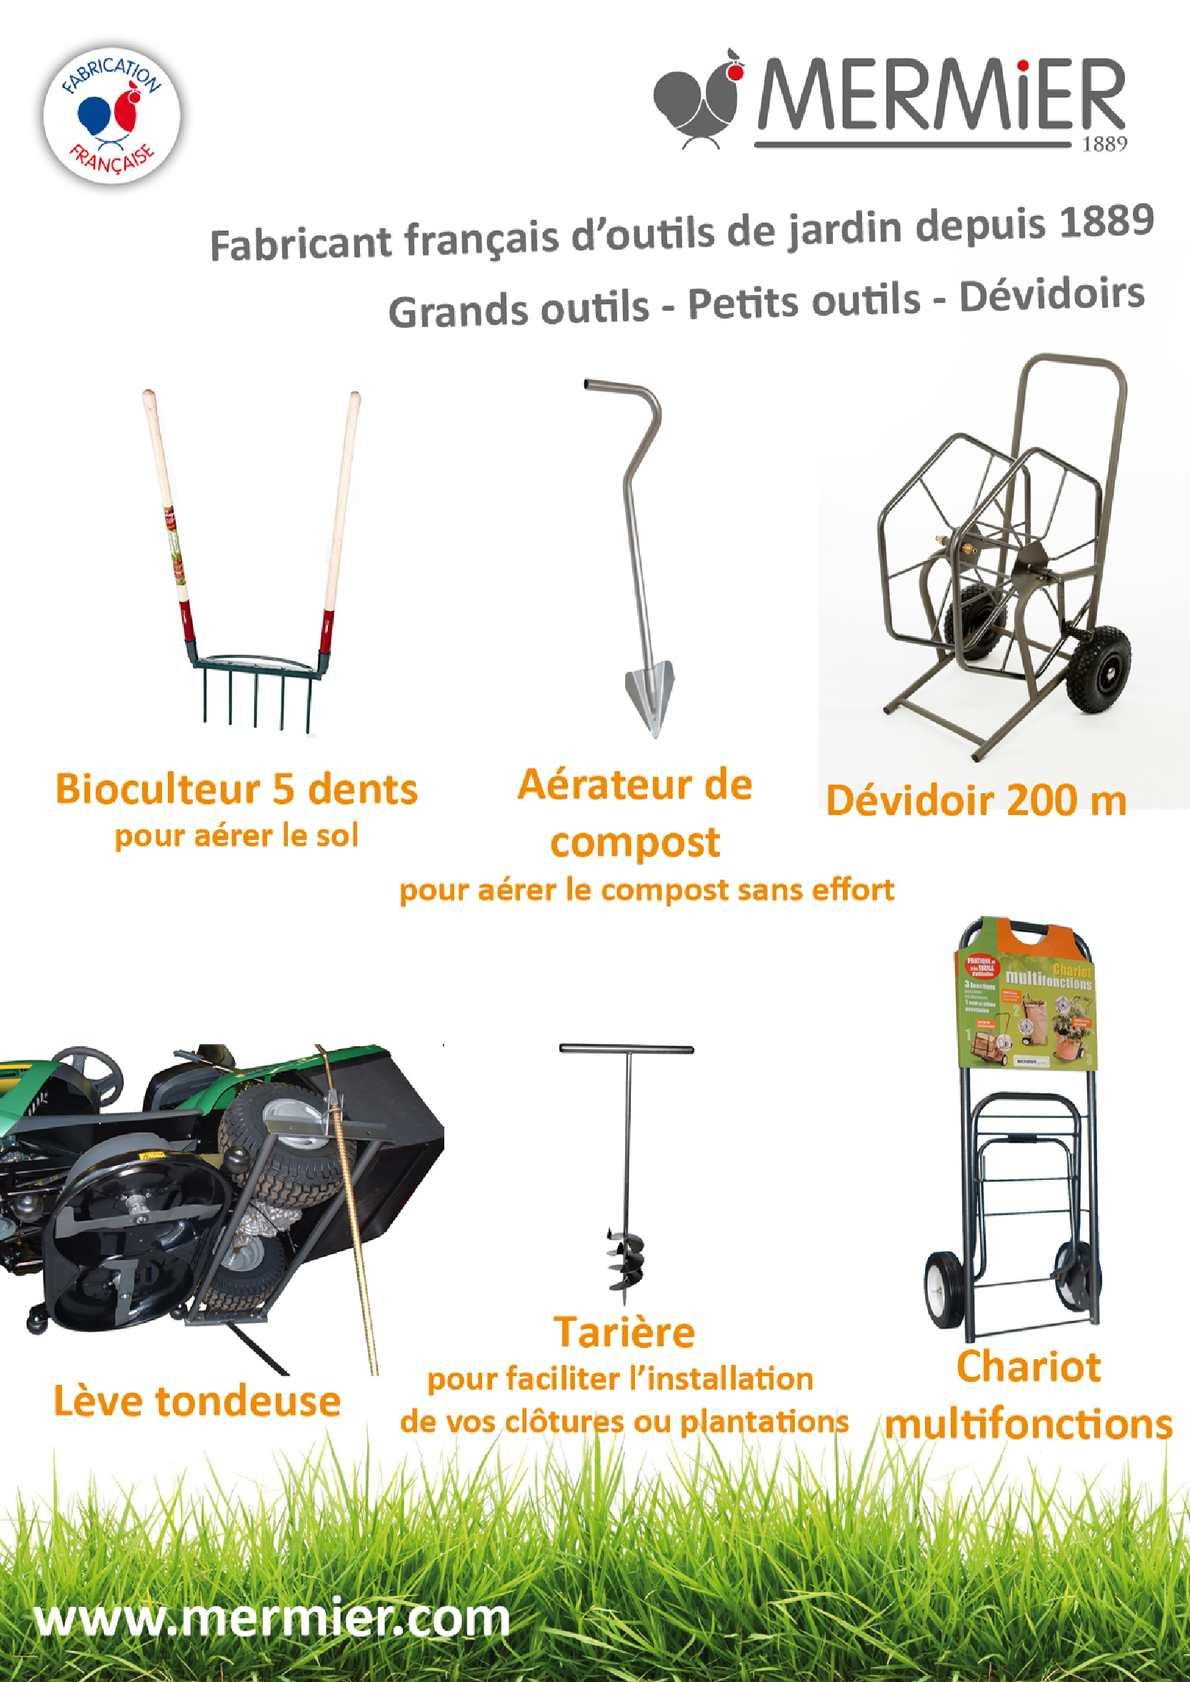 Guide Jardin 2014 Mr.bricolage - Calameo Downloader tout Mermier Jardin